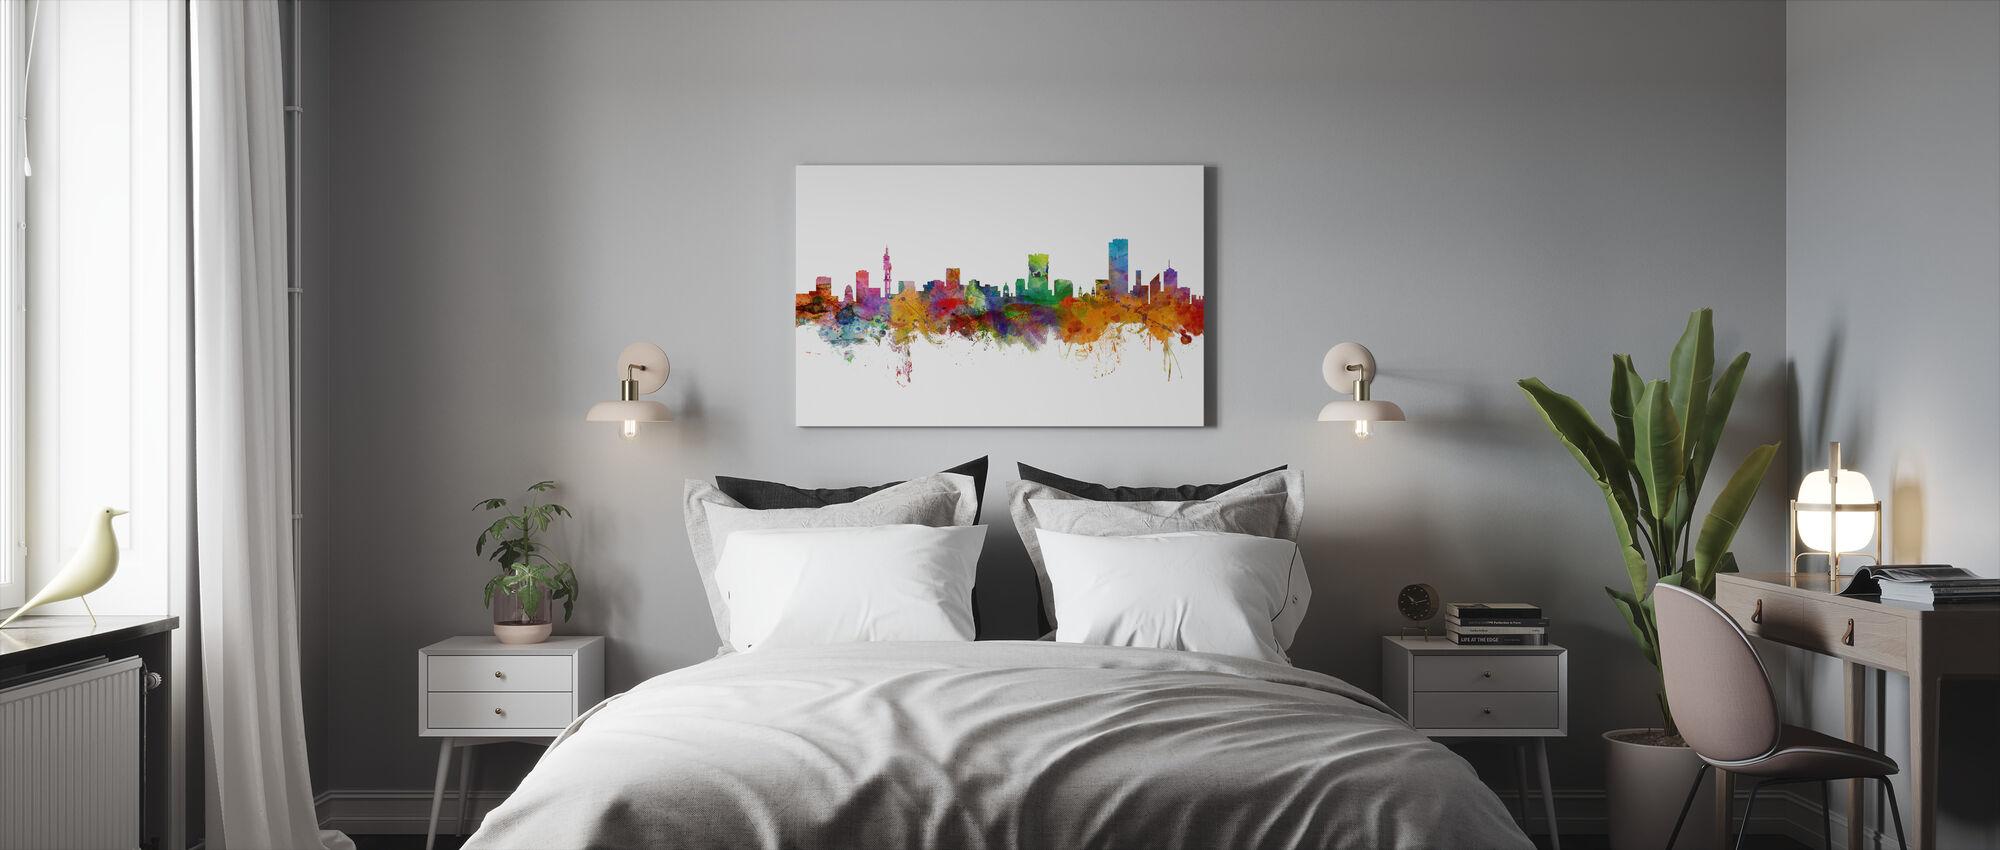 Pretoria South Africa Skyline - Canvas print - Bedroom